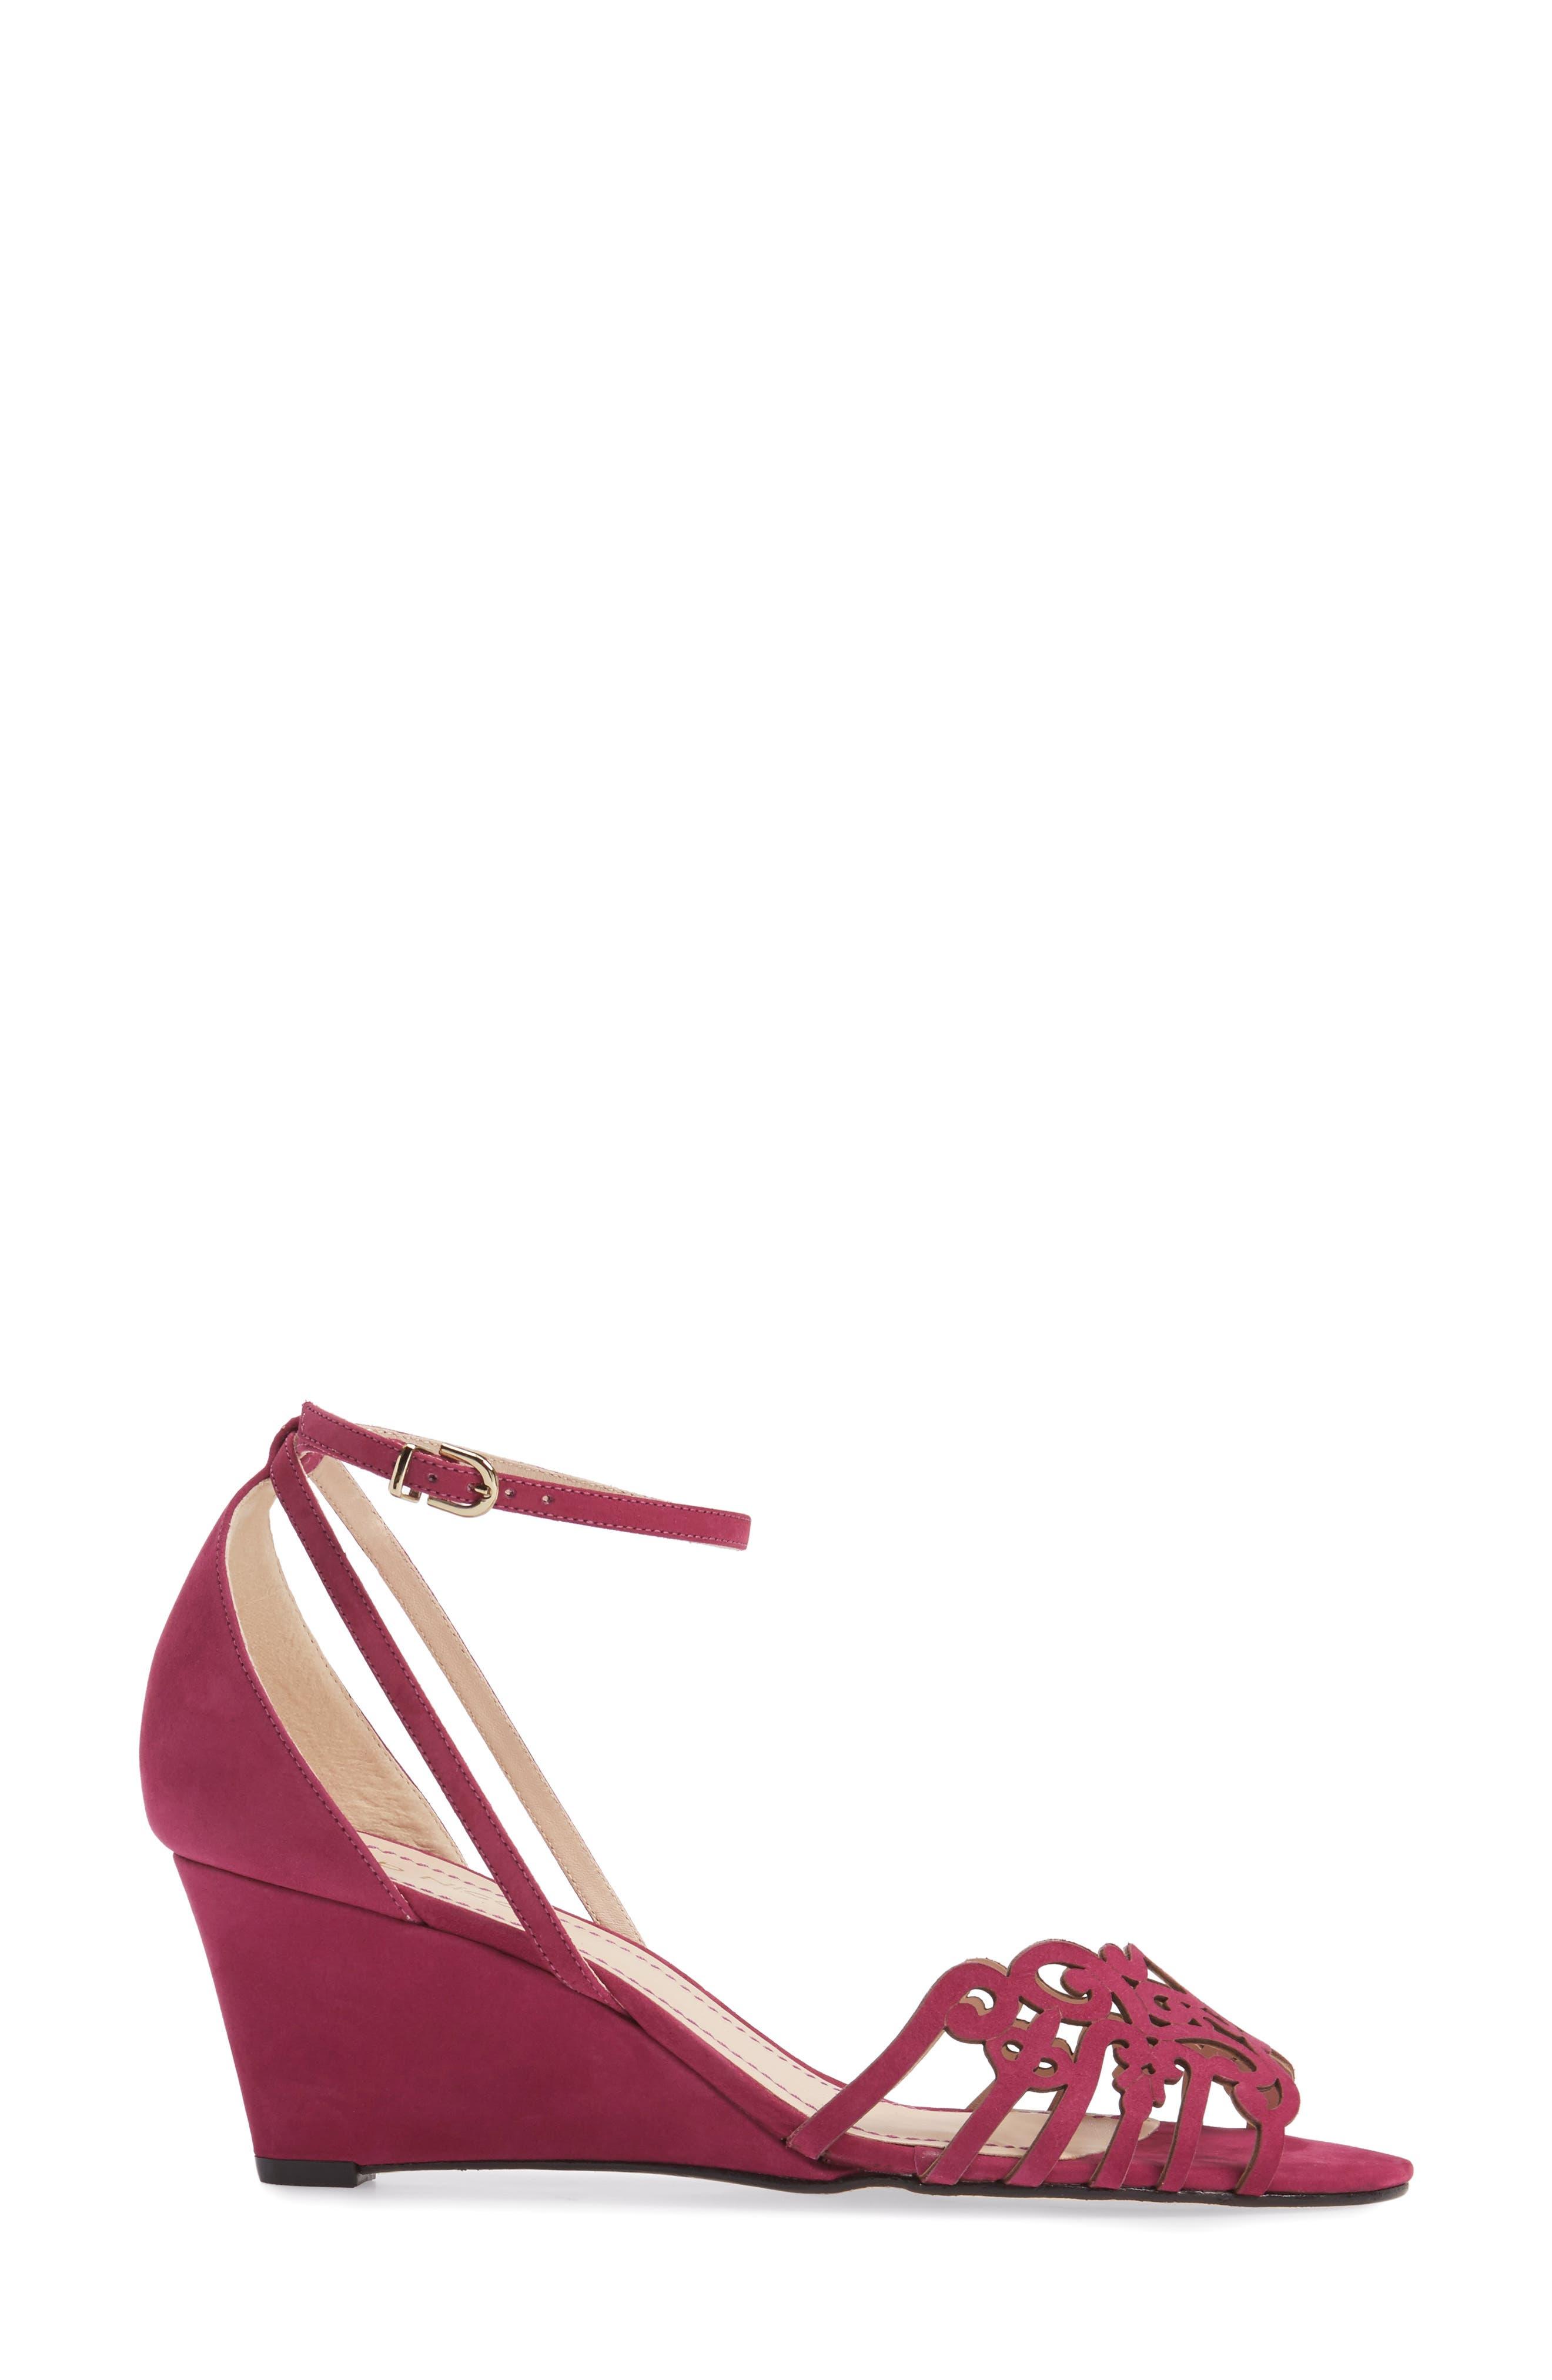 KLUB NICO, 'Kingston' Ankle Strap Wedge Sandal, Alternate thumbnail 3, color, MAGENTA LEATHER